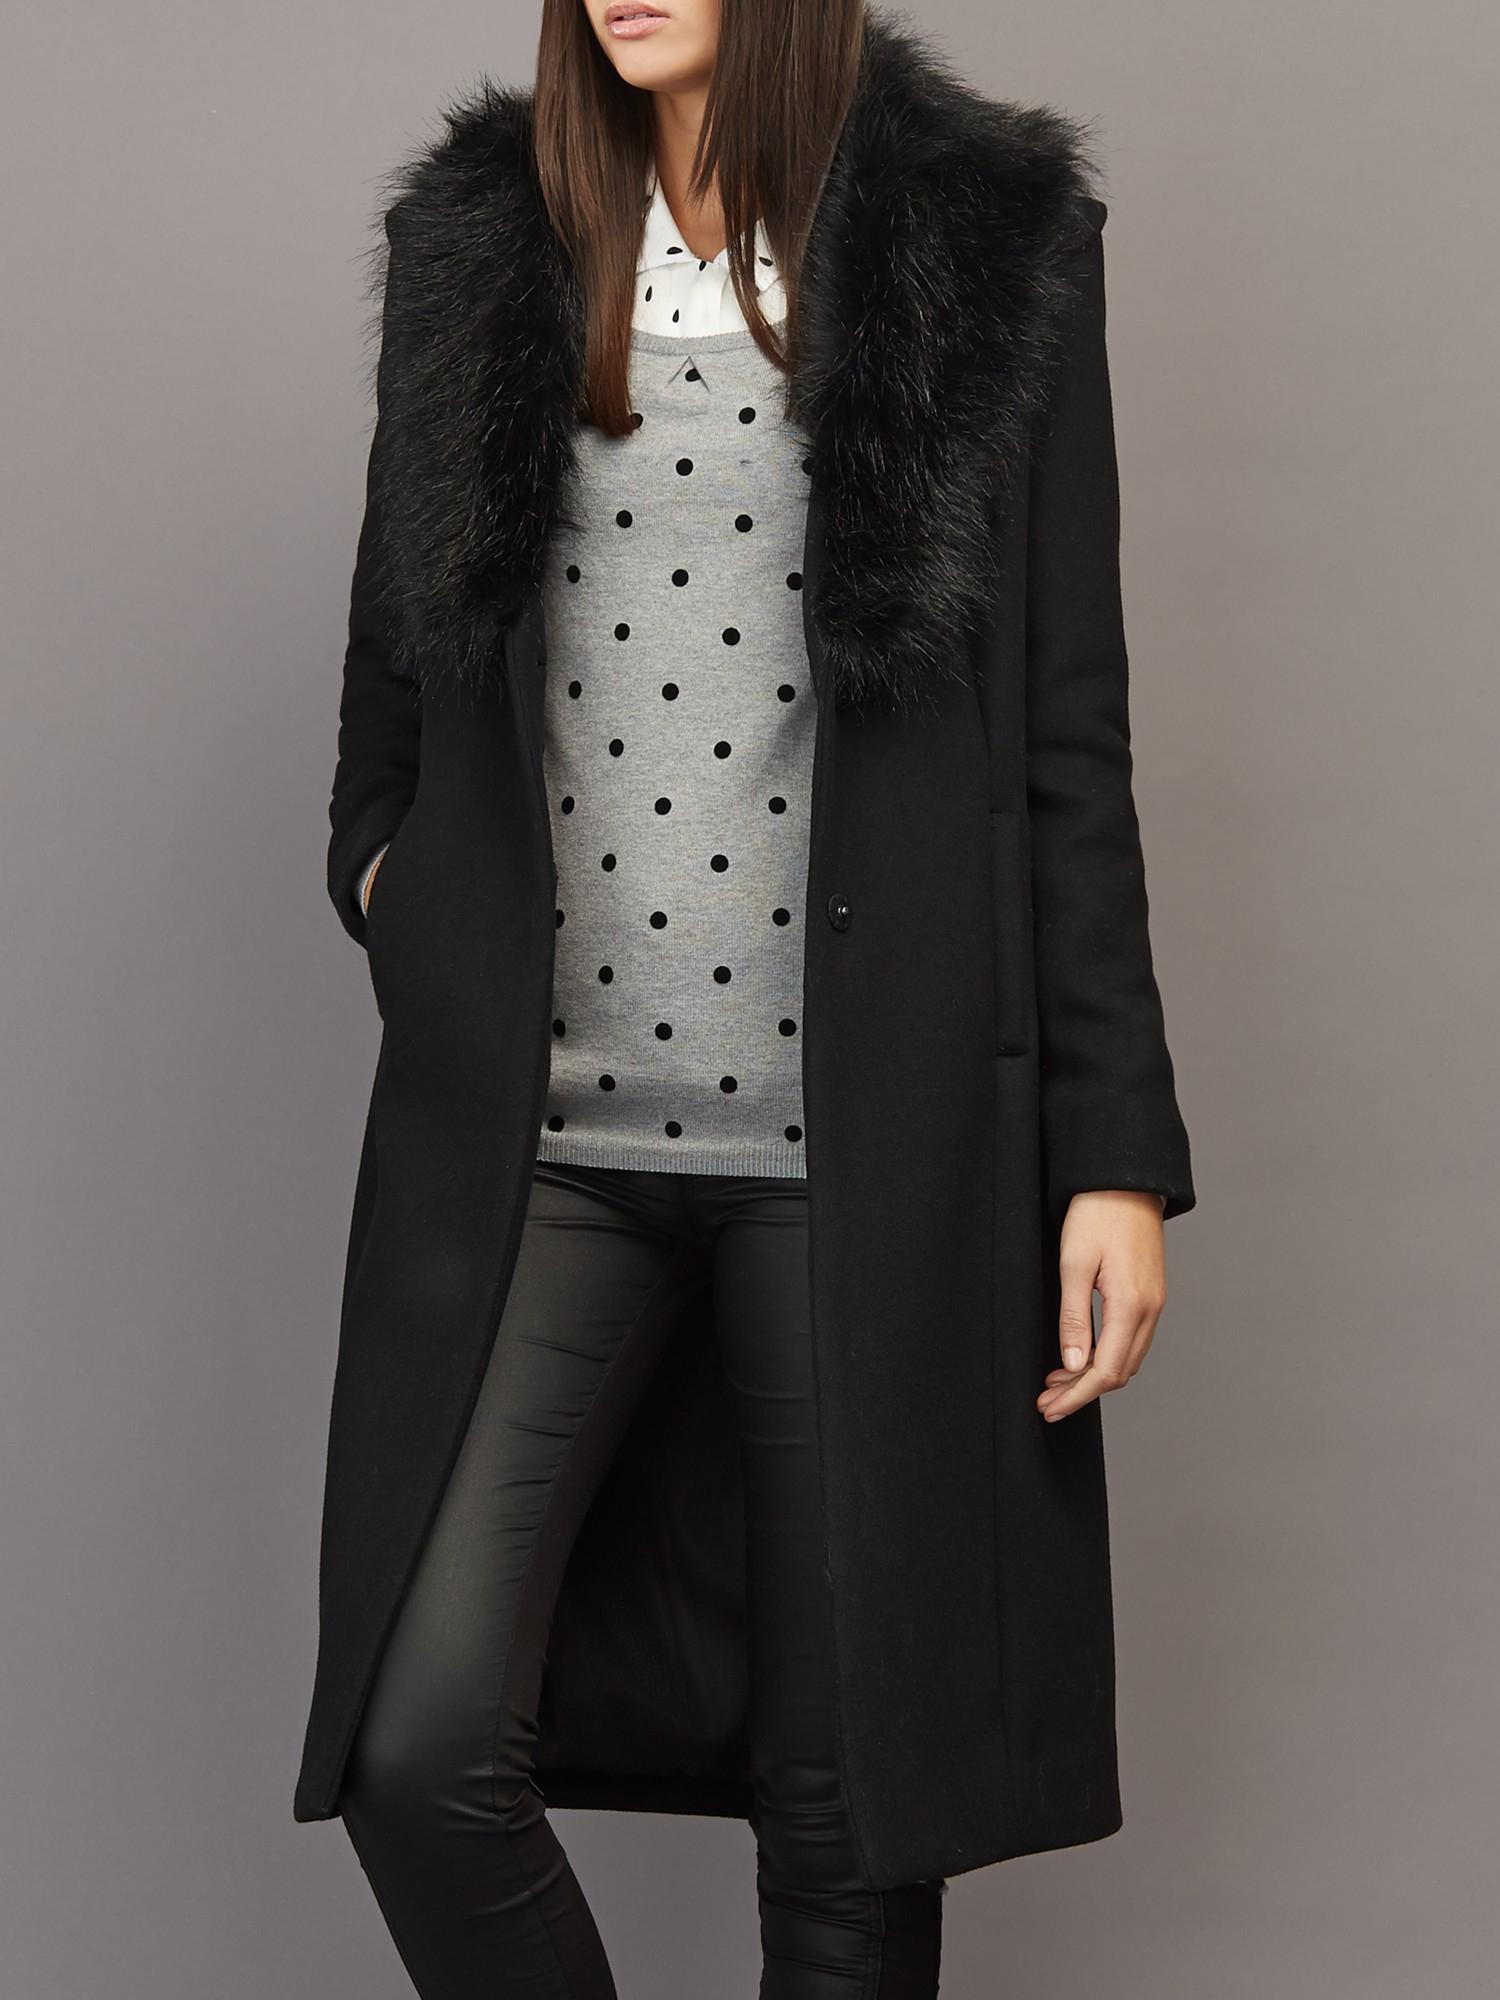 Supertrash Orora Faux Fur Collar Coat in Black | Lyst